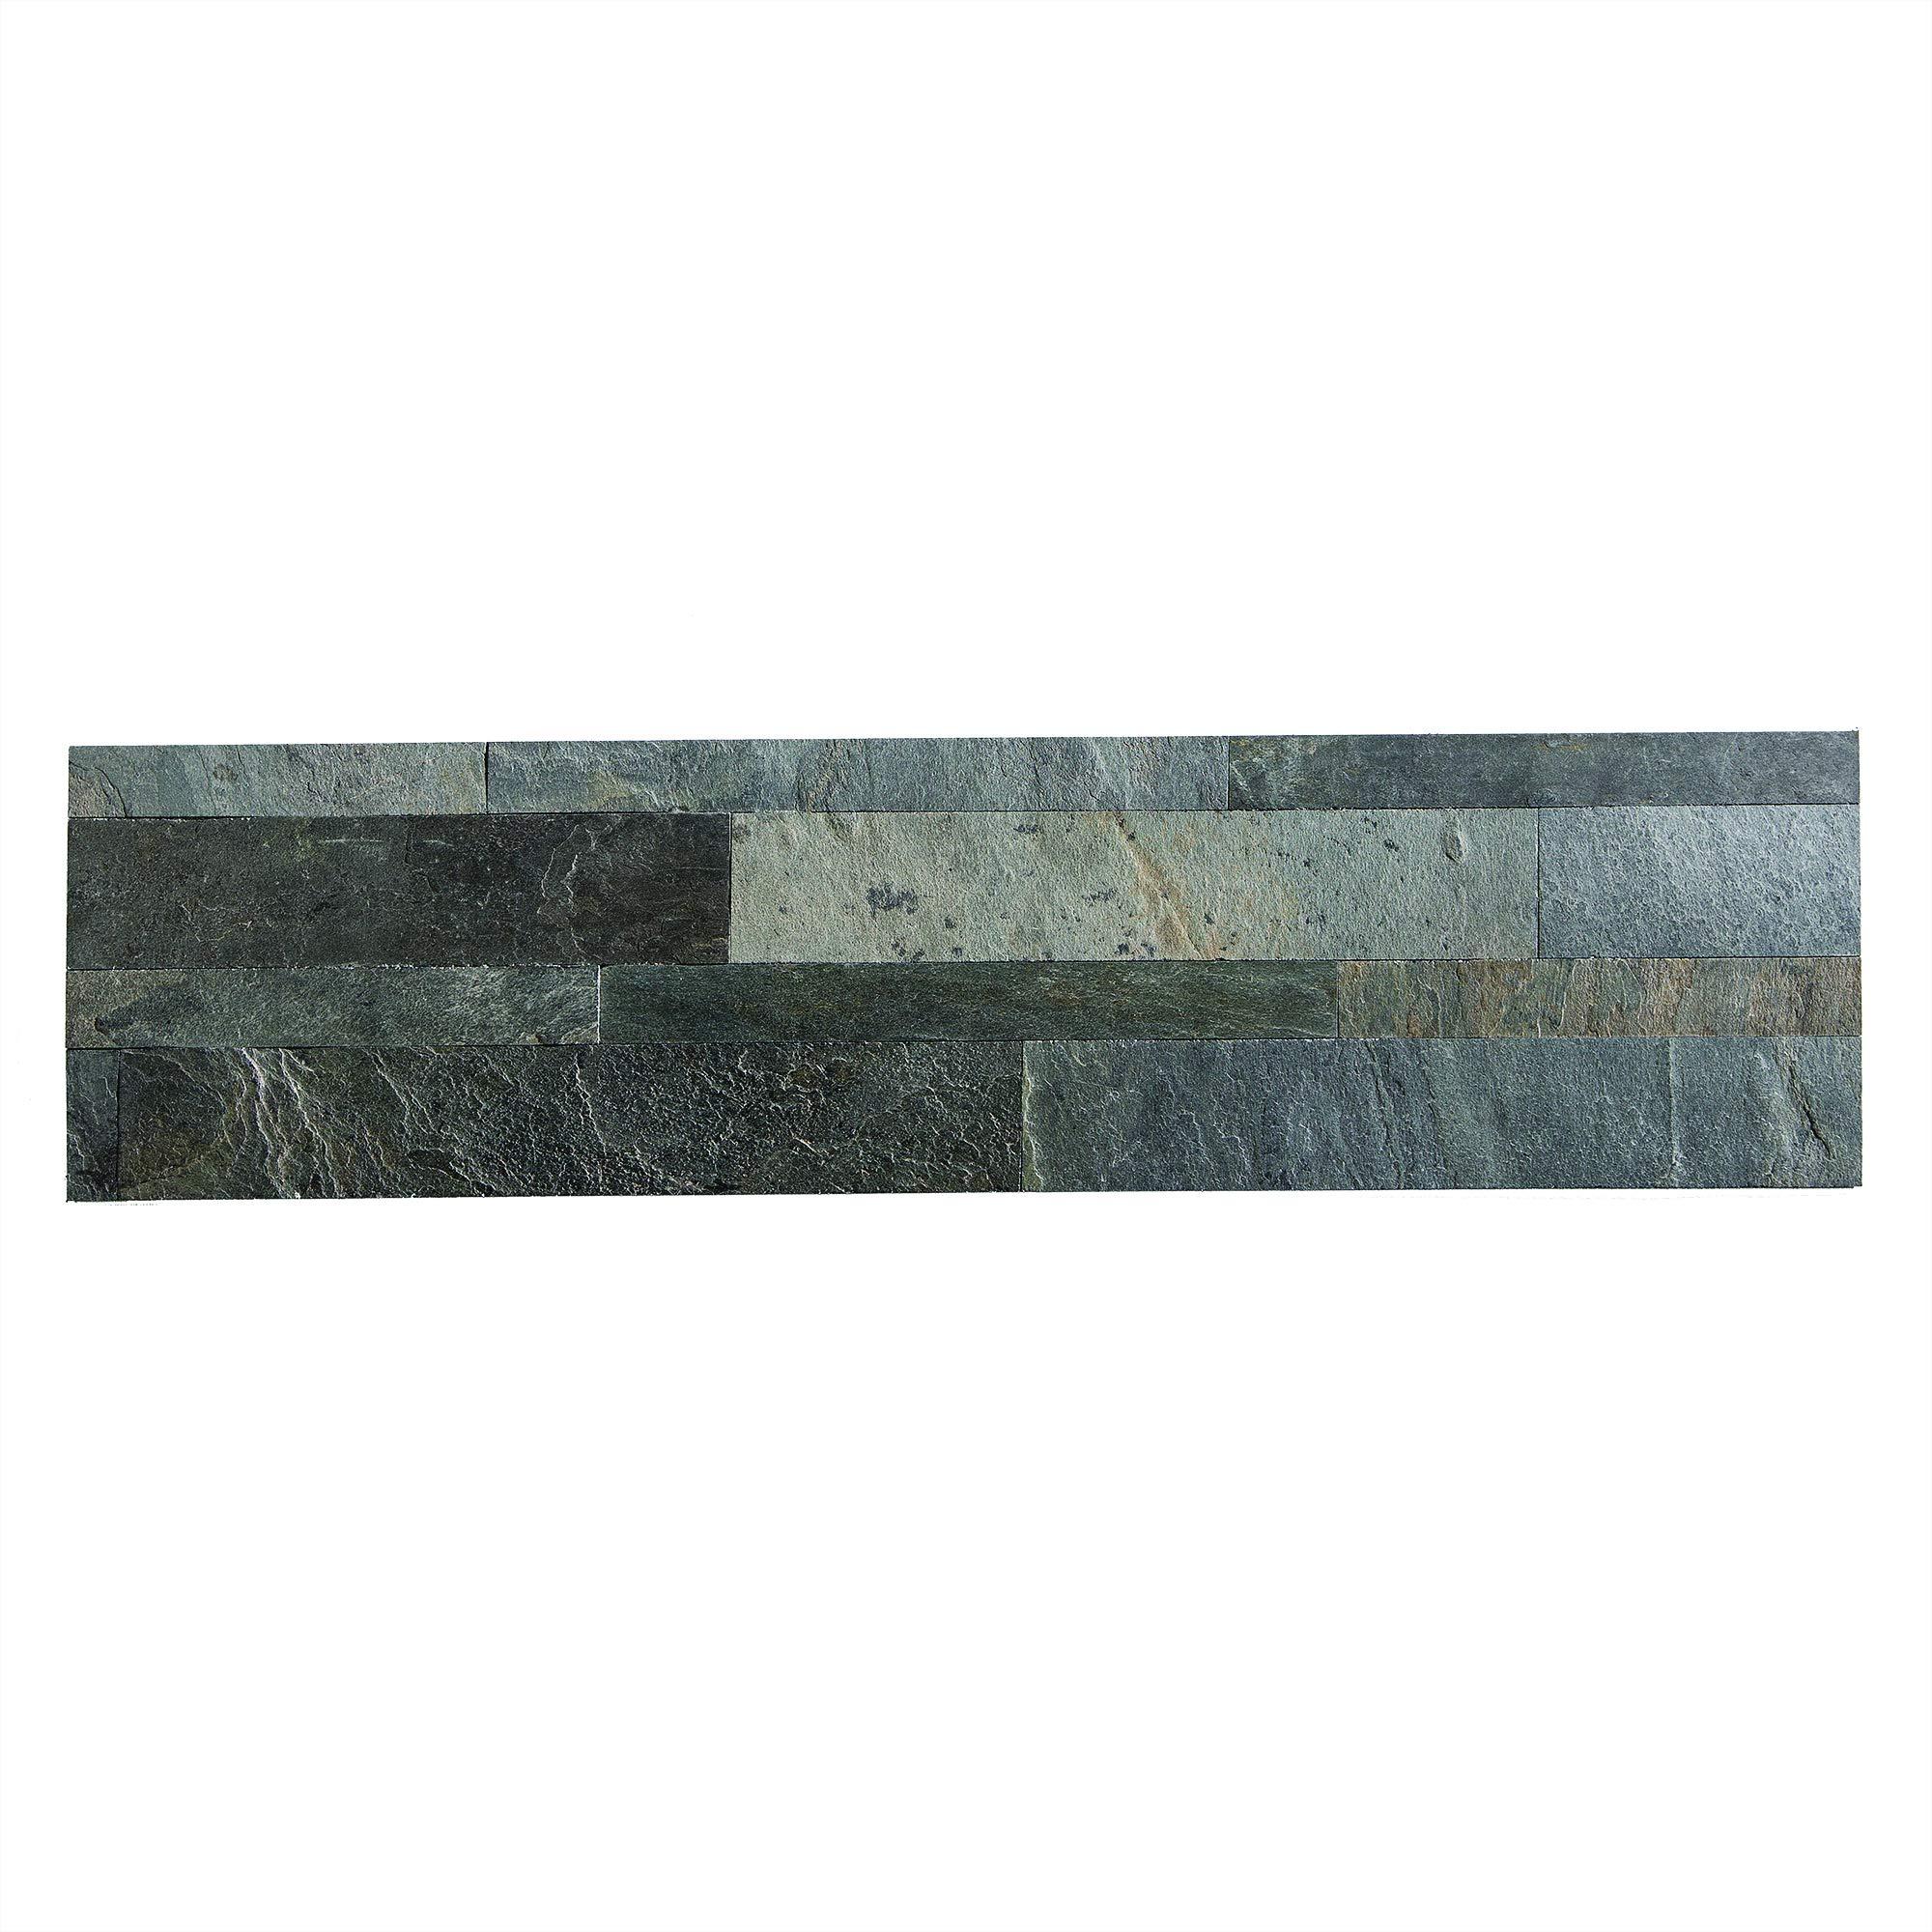 Aspect Peel and Stick Stone Overlay Kitchen Backsplash - Iron Slate (5.9'' x 23.6'' x 1/8'' Panel - Approx. 1 sq ft) - Easy DIY Tile Backsplash